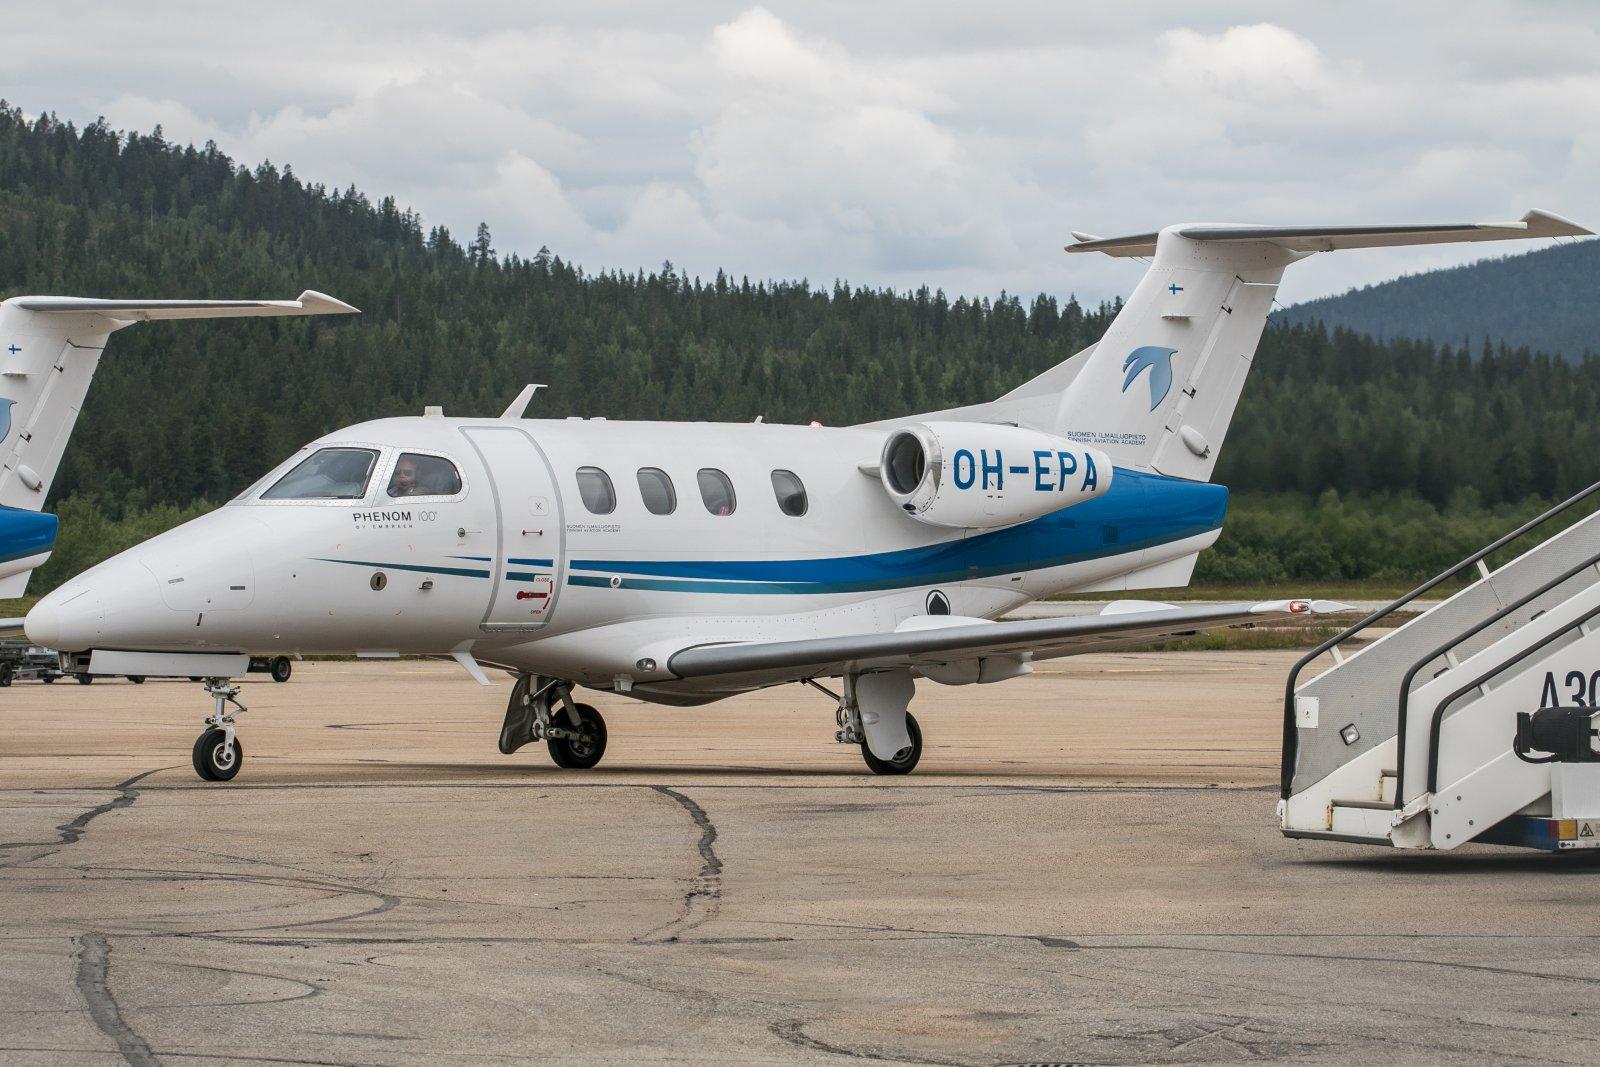 OH-EPA. Embraer Phenom 100. 16.7.2019